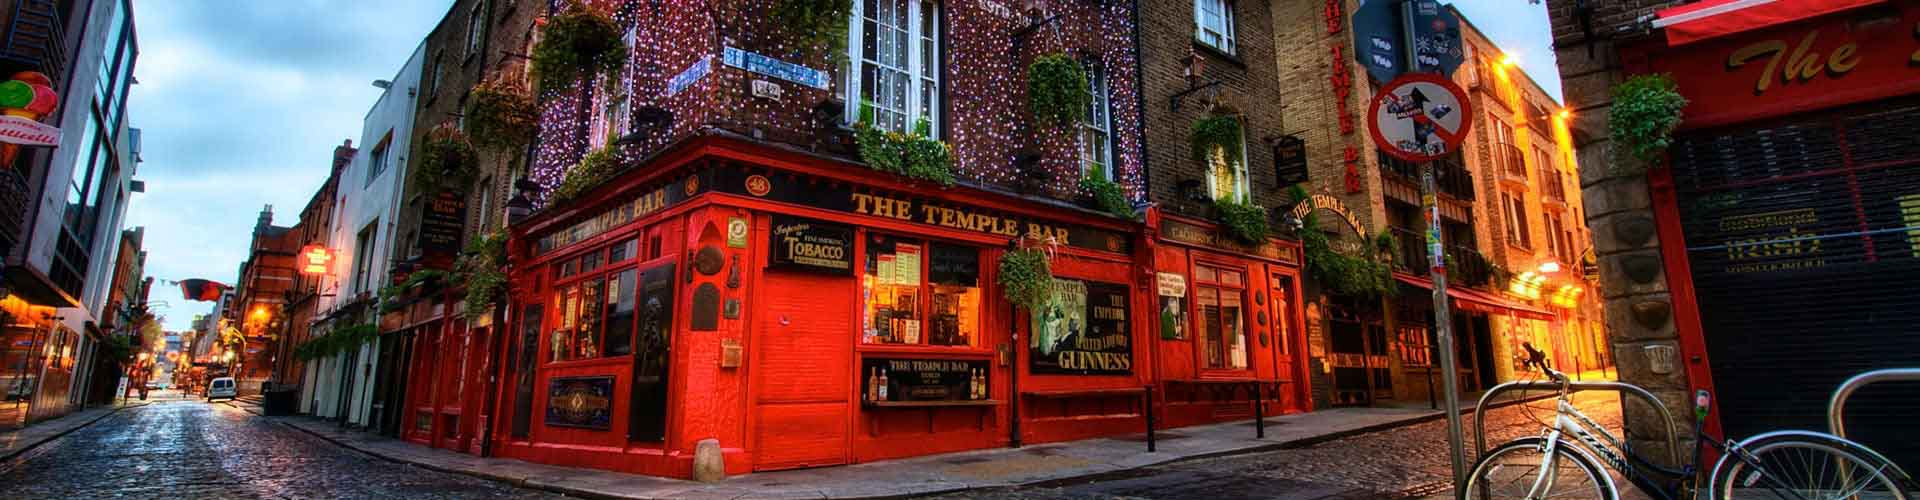 Dublín - Albergues Juveniles en el distrito Temple Bar . Mapas de Dublín, Fotos y Comentarios para cada Albergue Juvenil en Dublín.